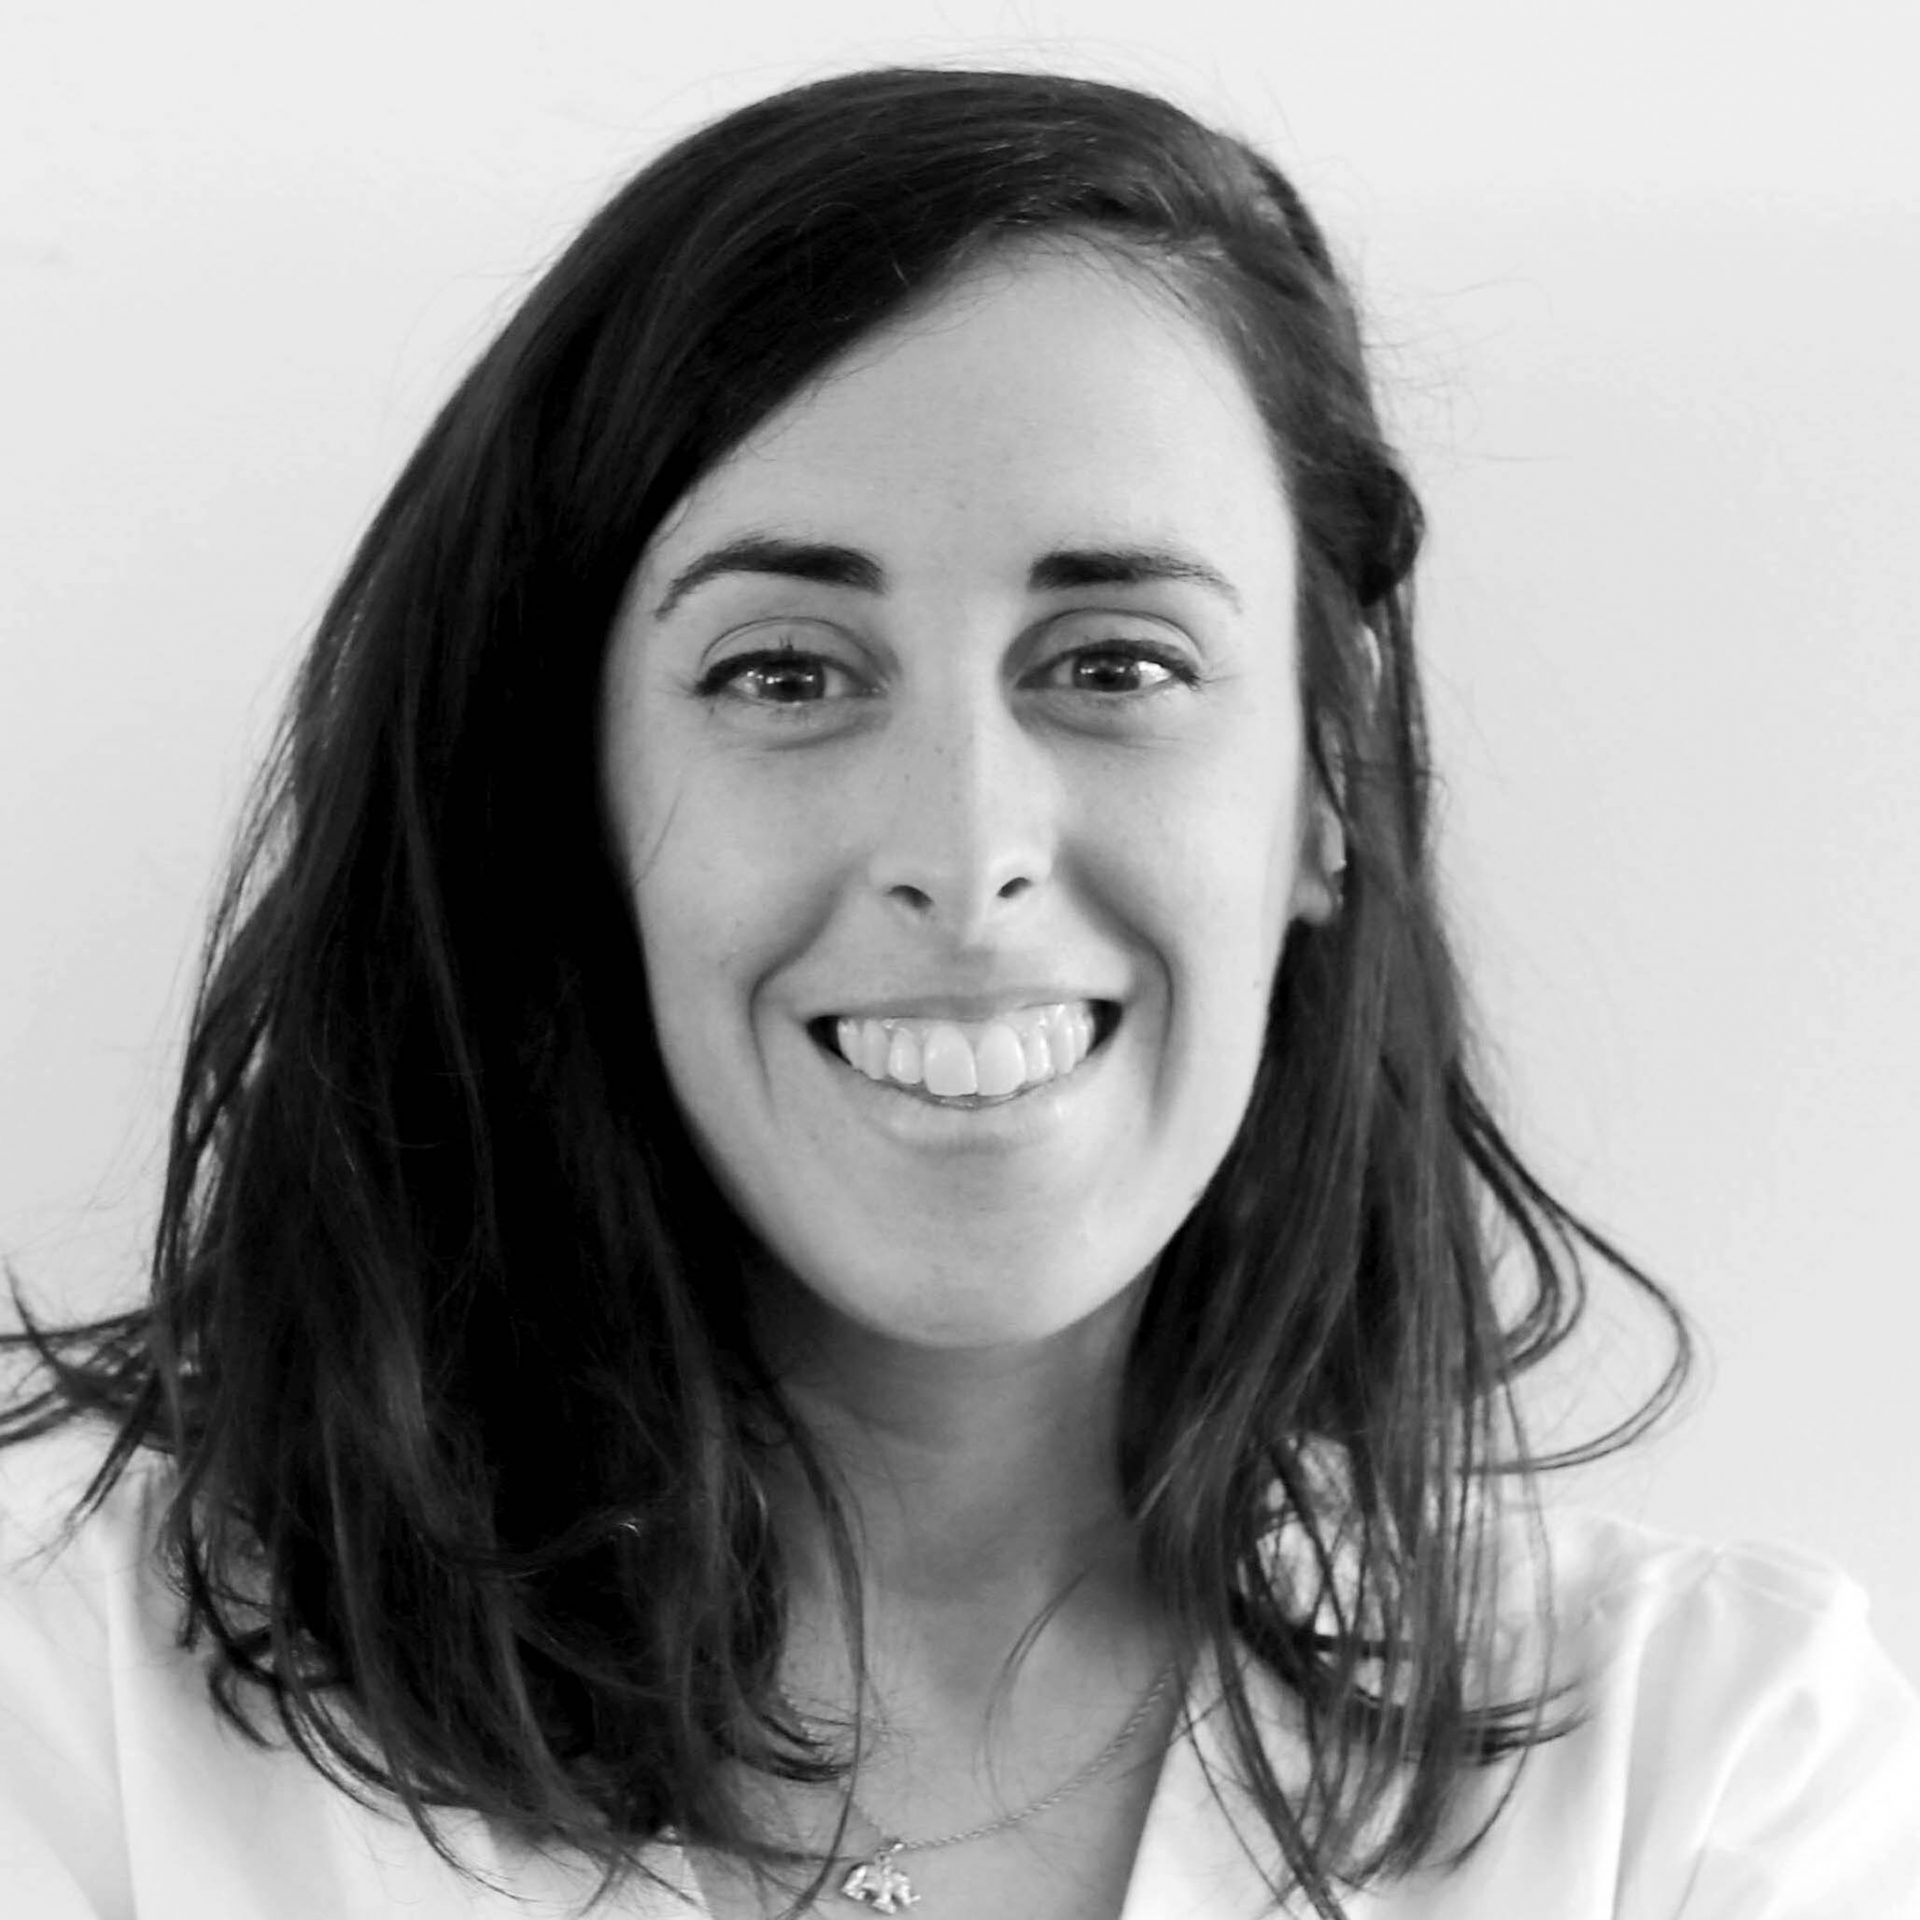 https://ksrarchitects.com/wp-content/uploads/2020/12/Paula-Benitez-Ruiz-scaled.jpg